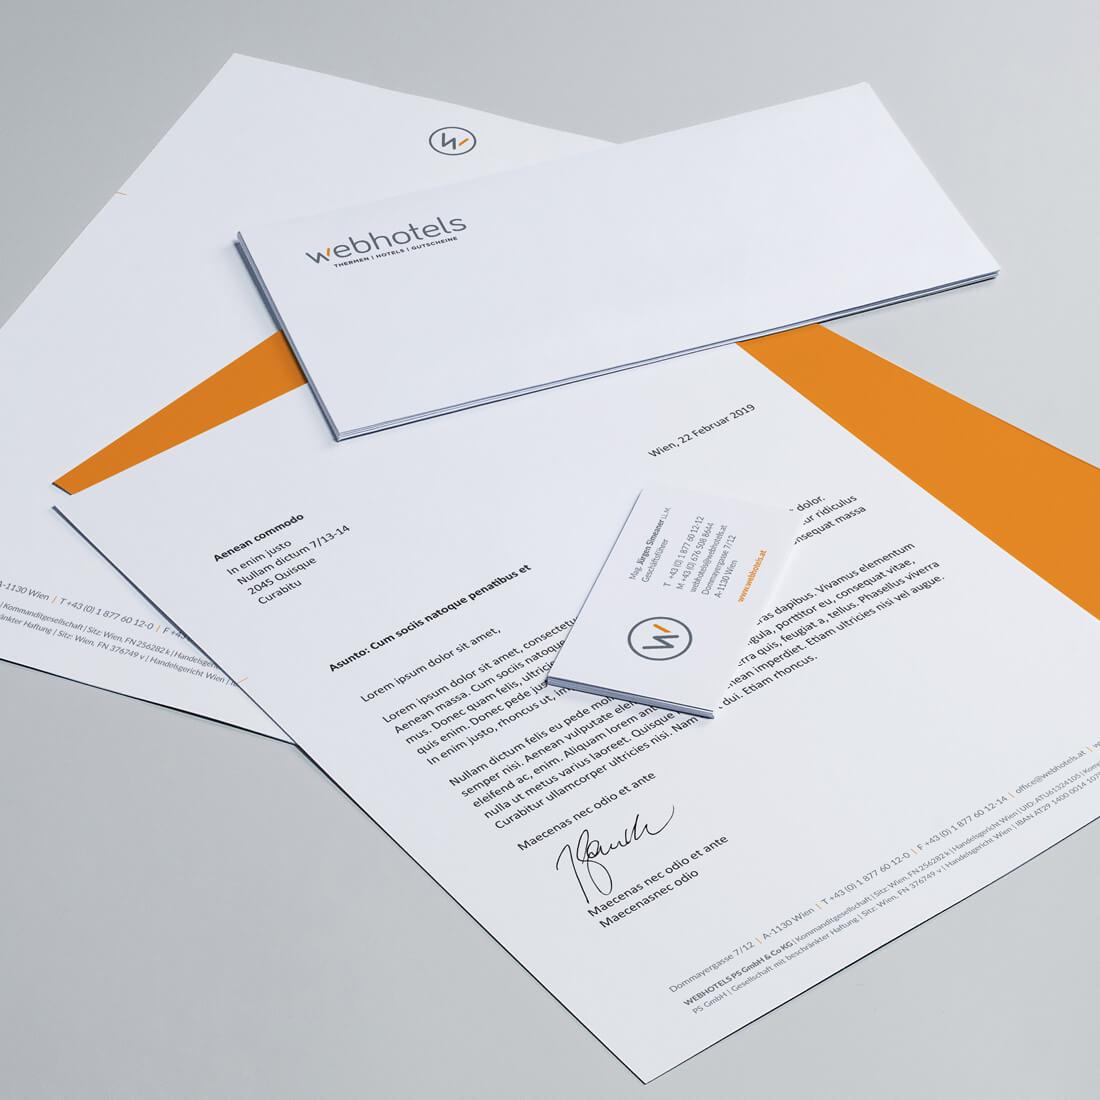 barbara tabery jalun design graphic design corporate design branding webdesign annua report barcelona vienna valencia mallorca corporate design german logos web pages art director